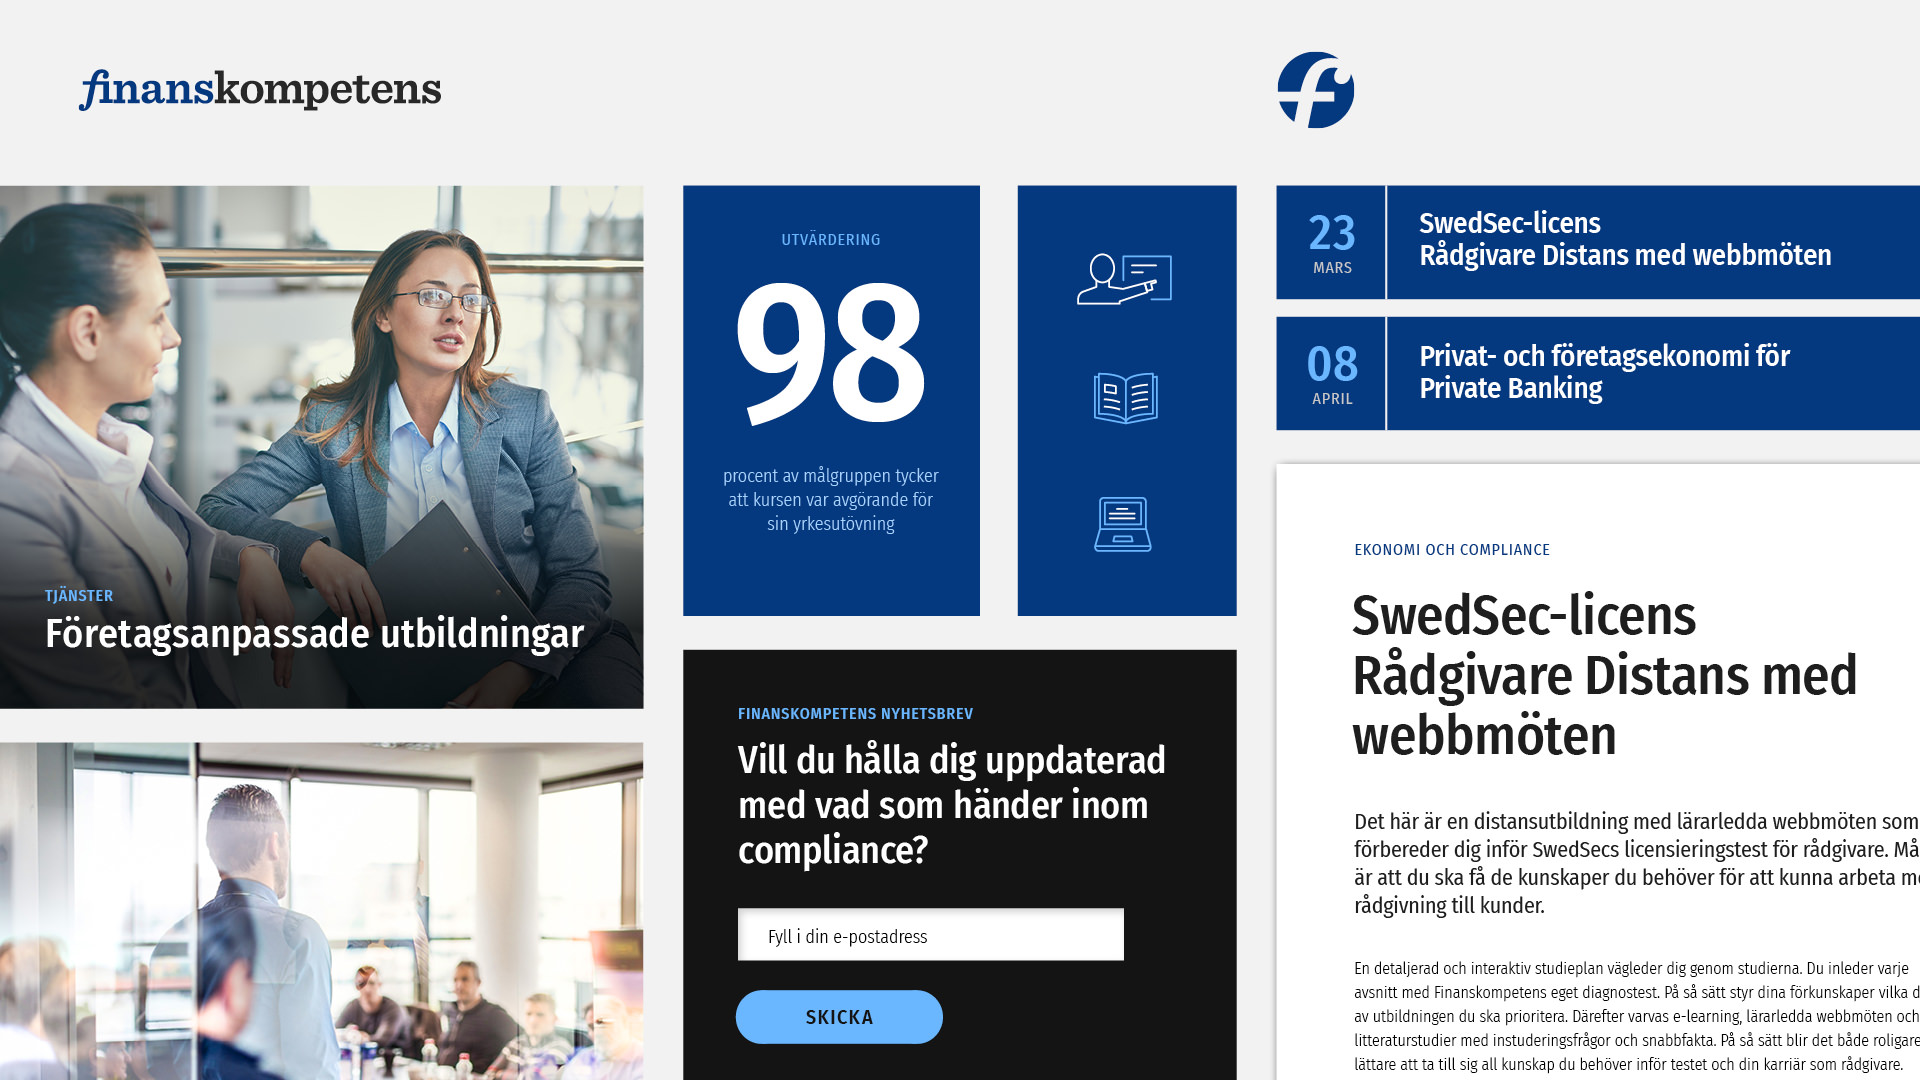 design-brand-identity_grafisk-profil-finanskompetens